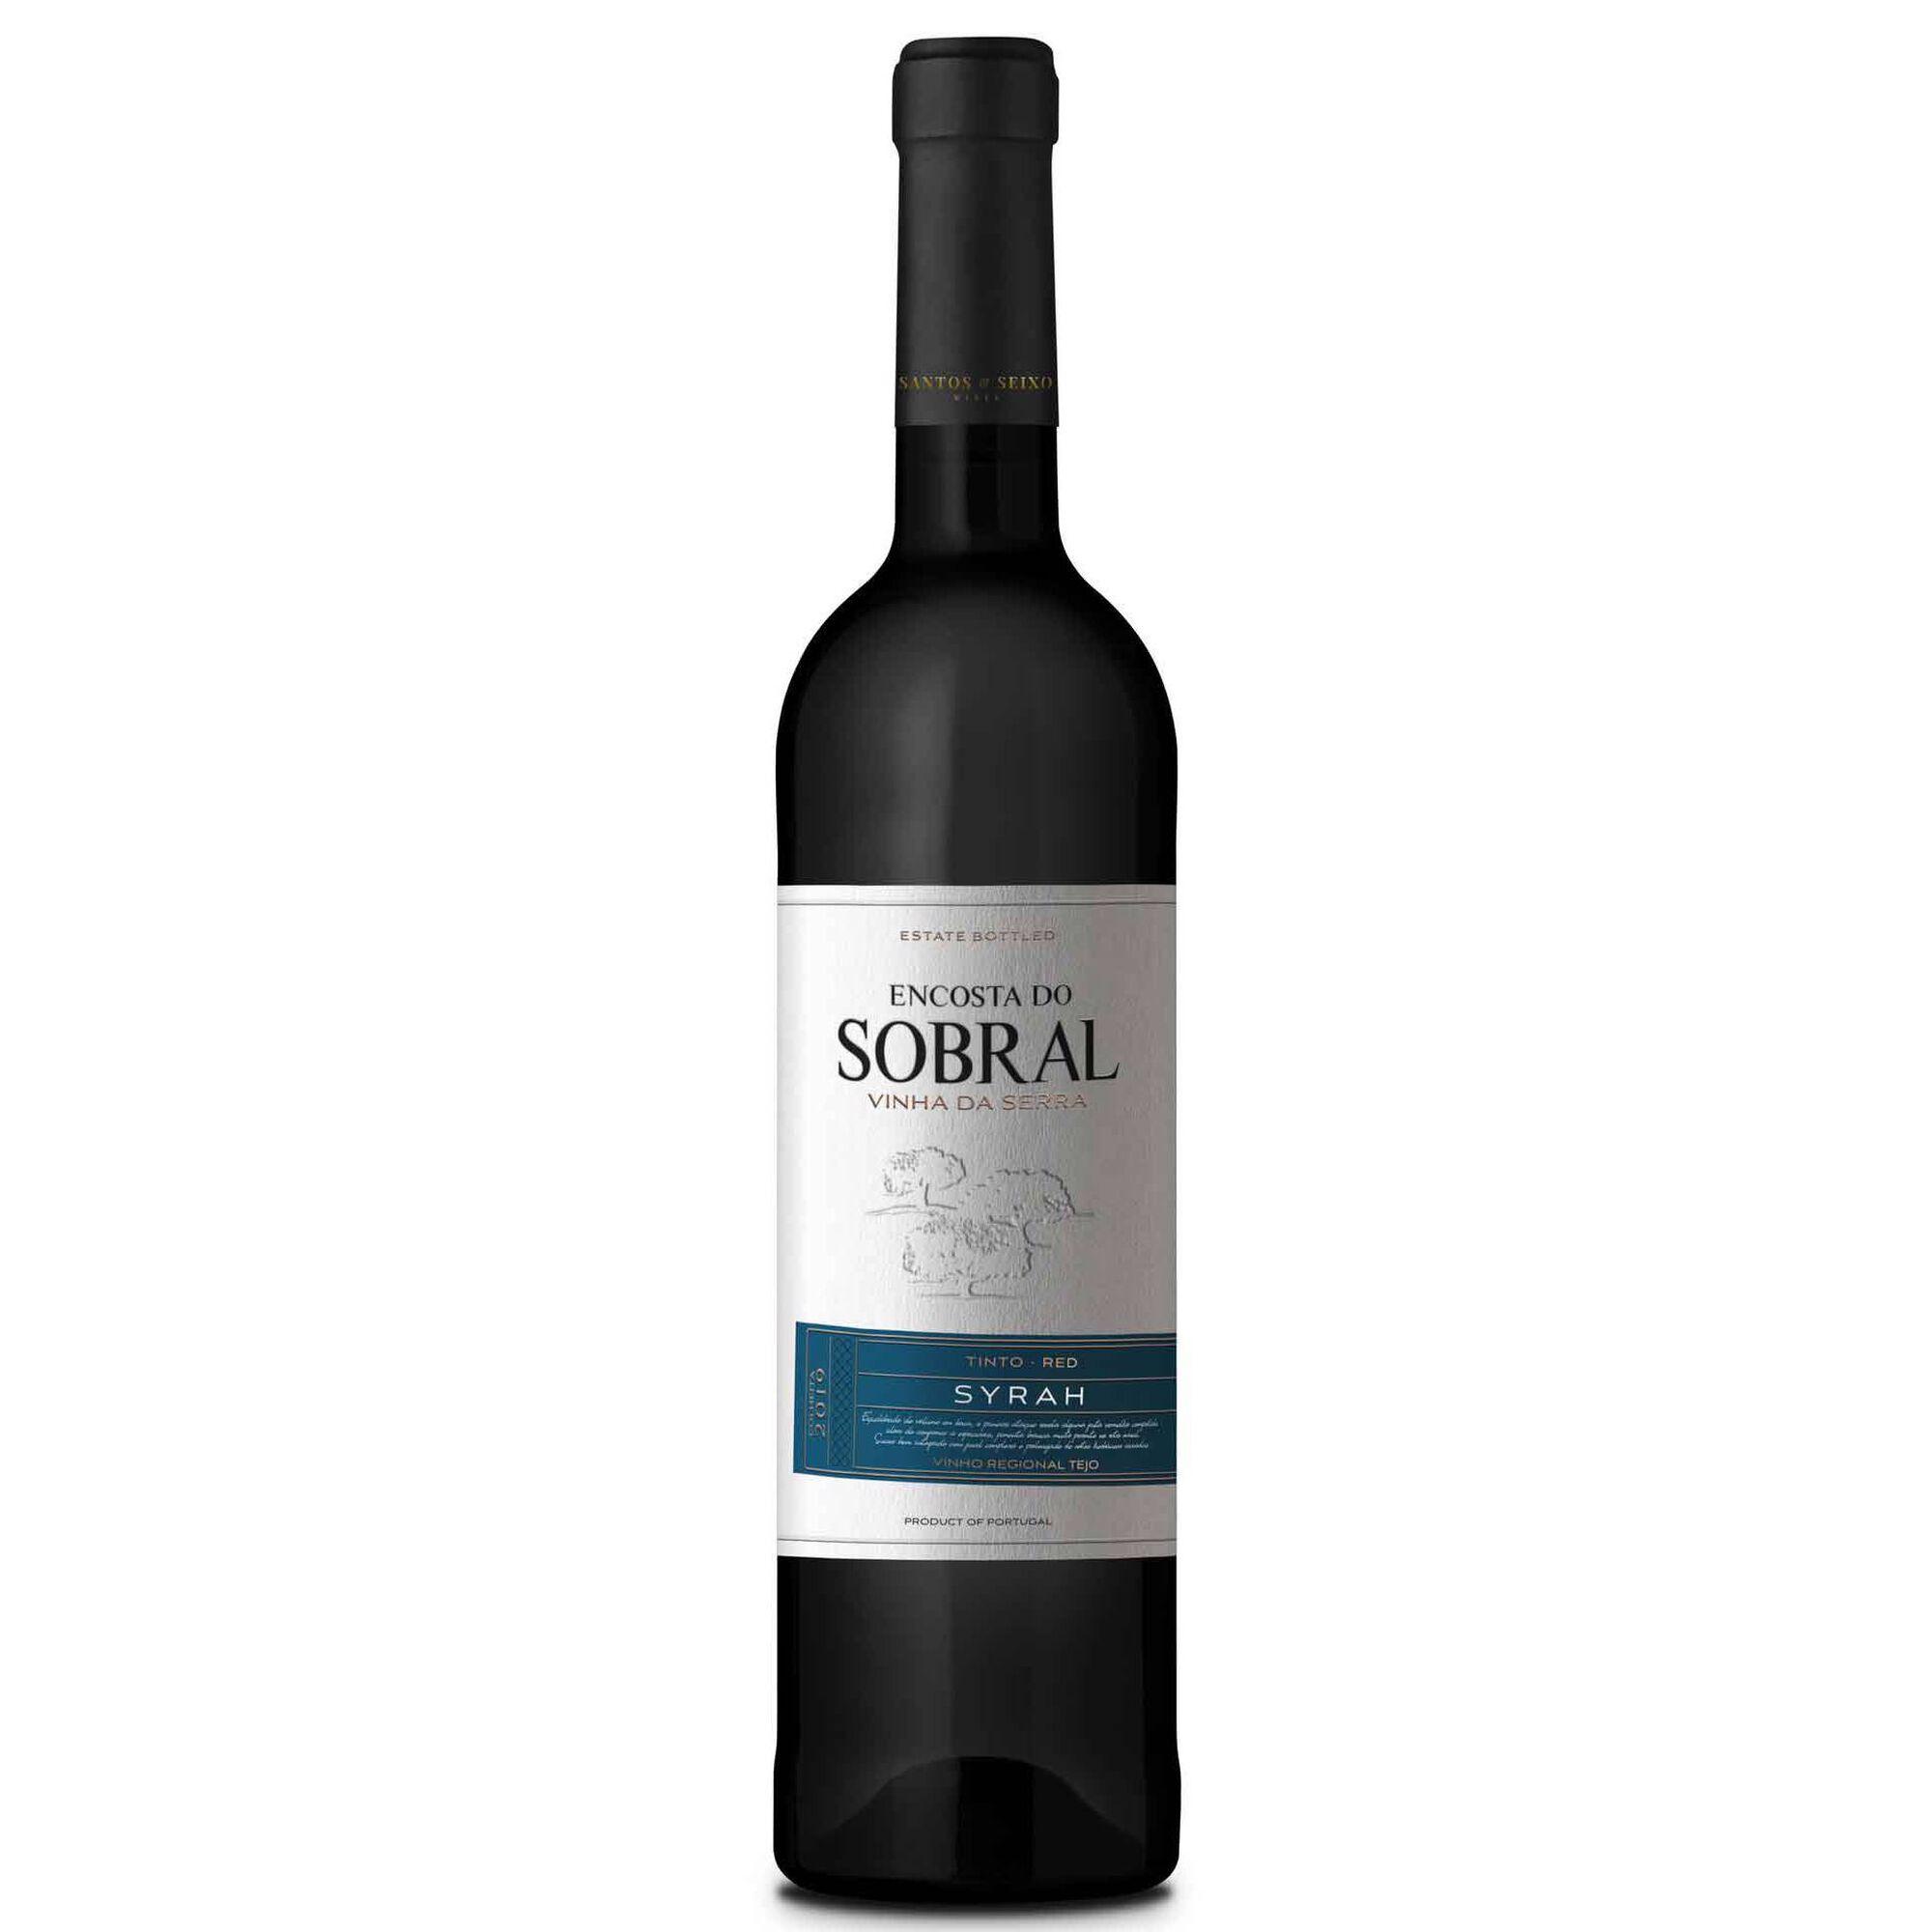 Encosta do Sobral Vinha da Serra Syrag Regional Tejo Vinho Tinto